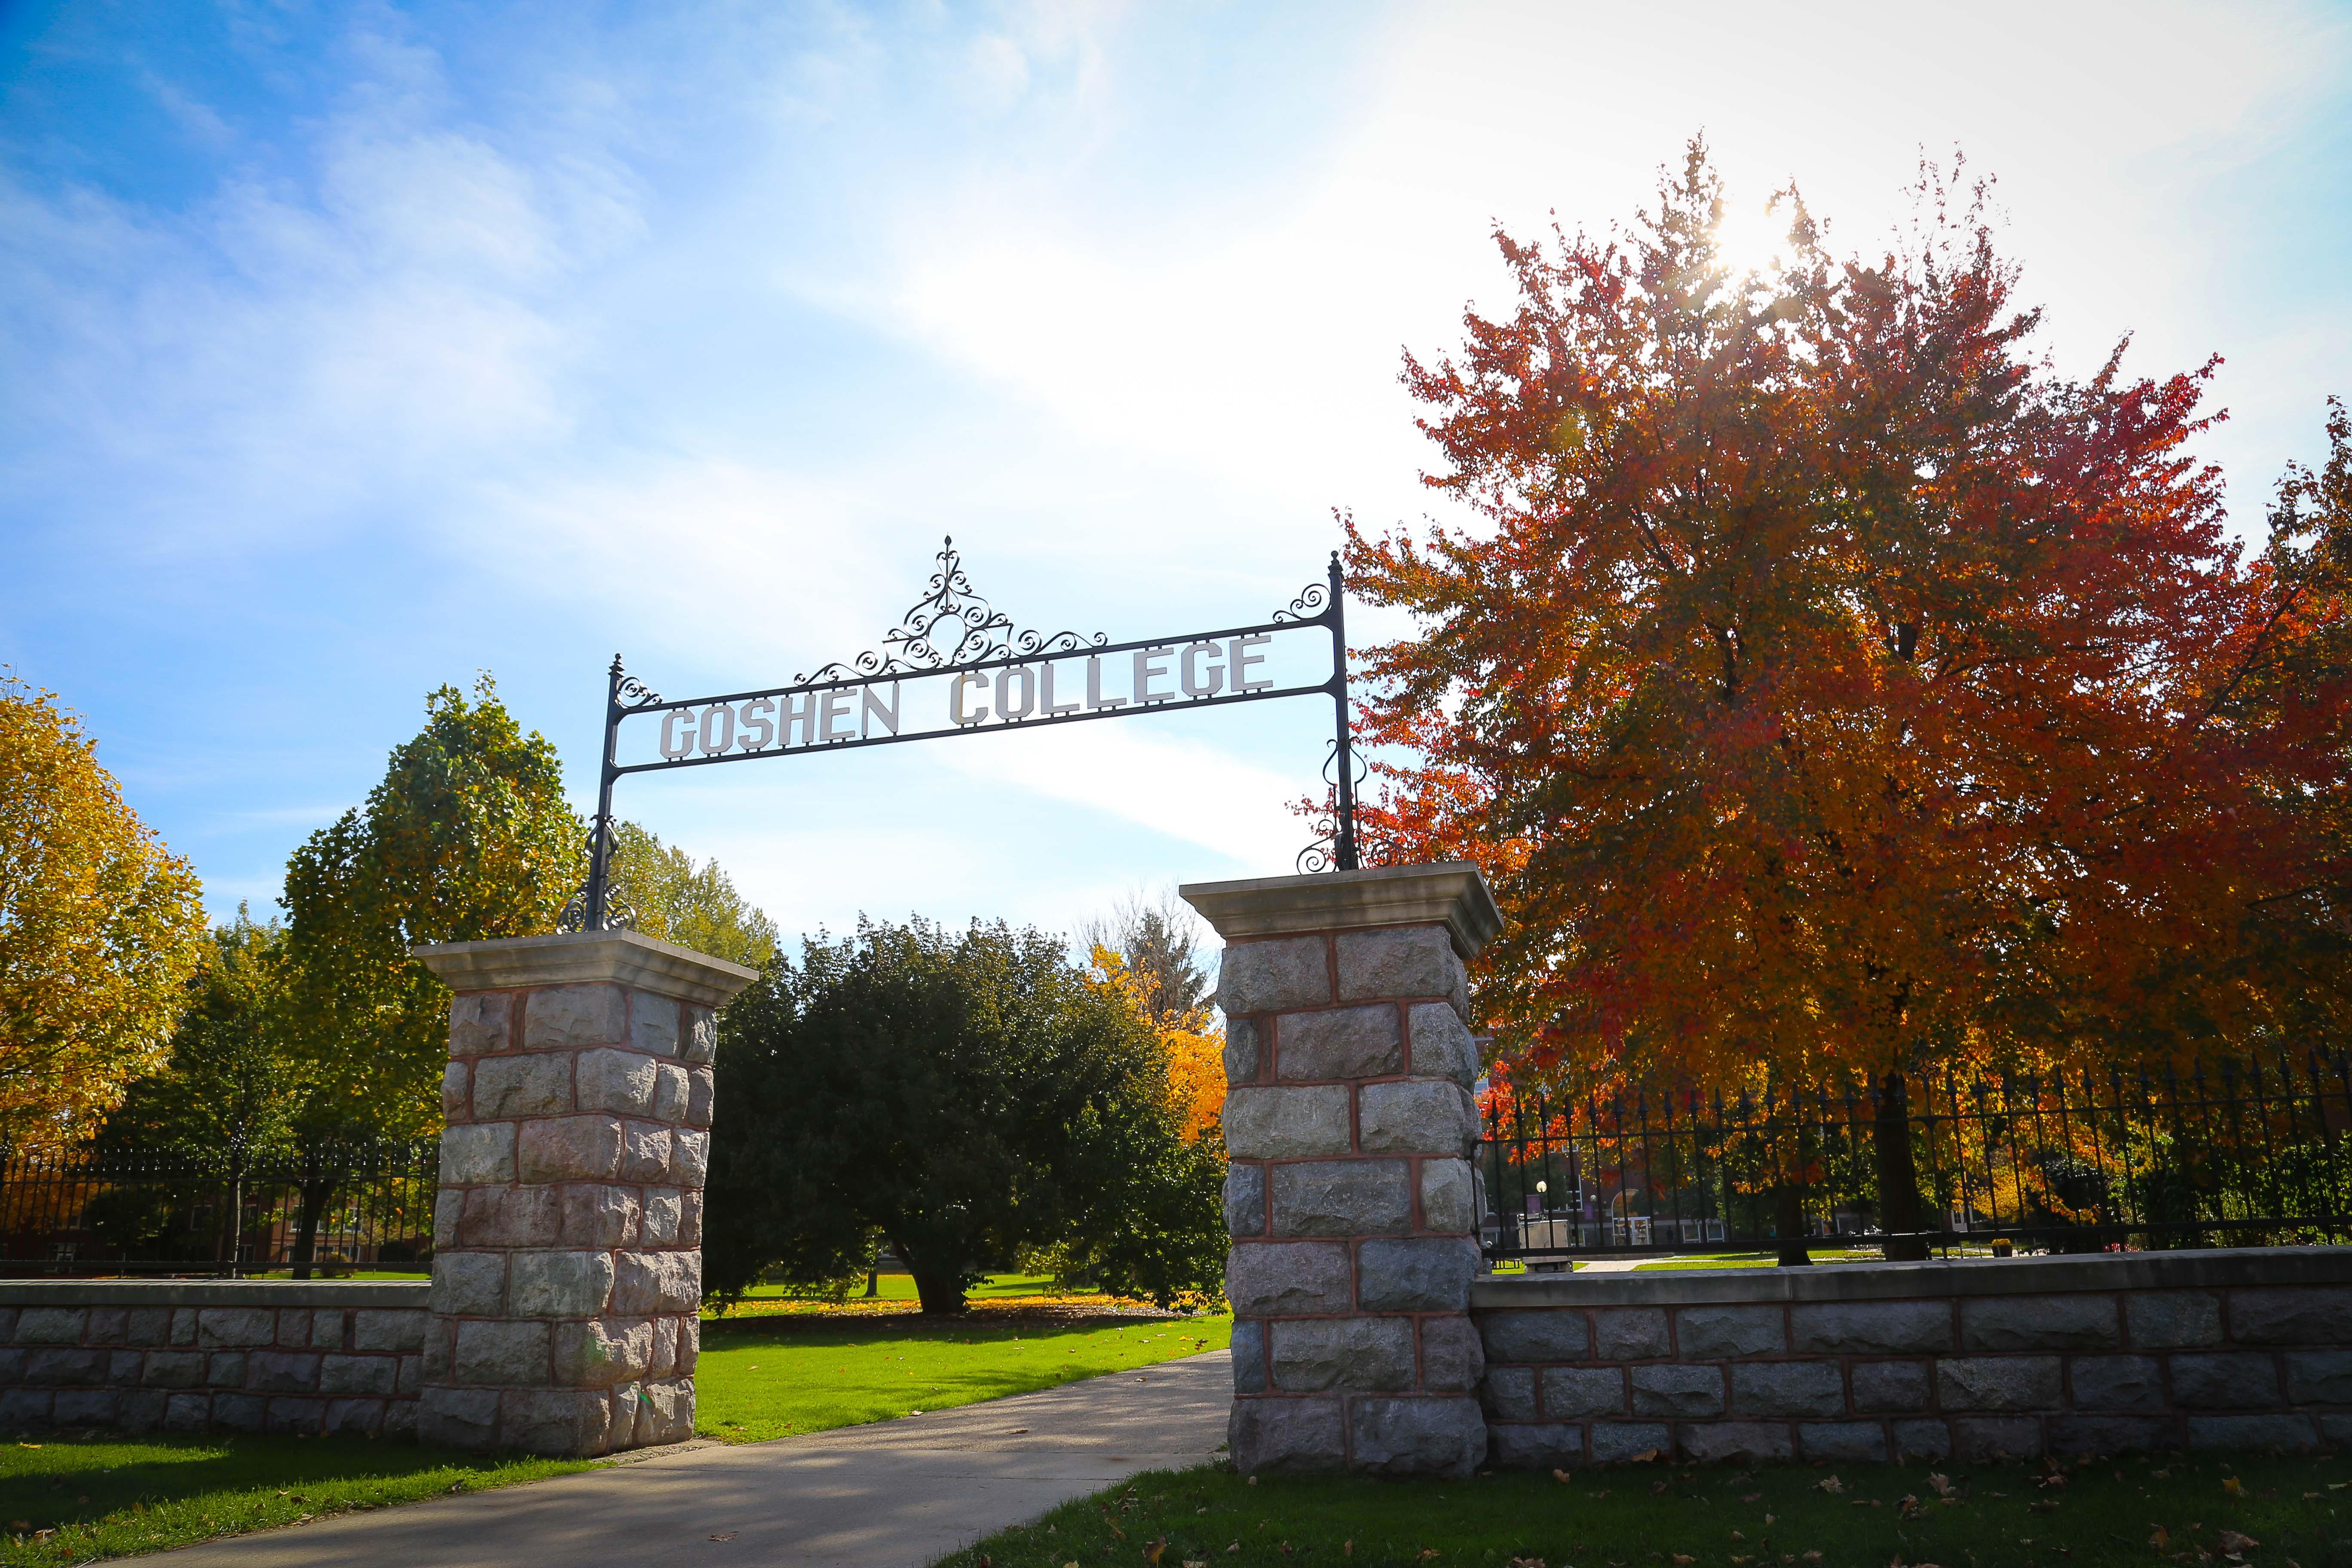 The Goshen College gate